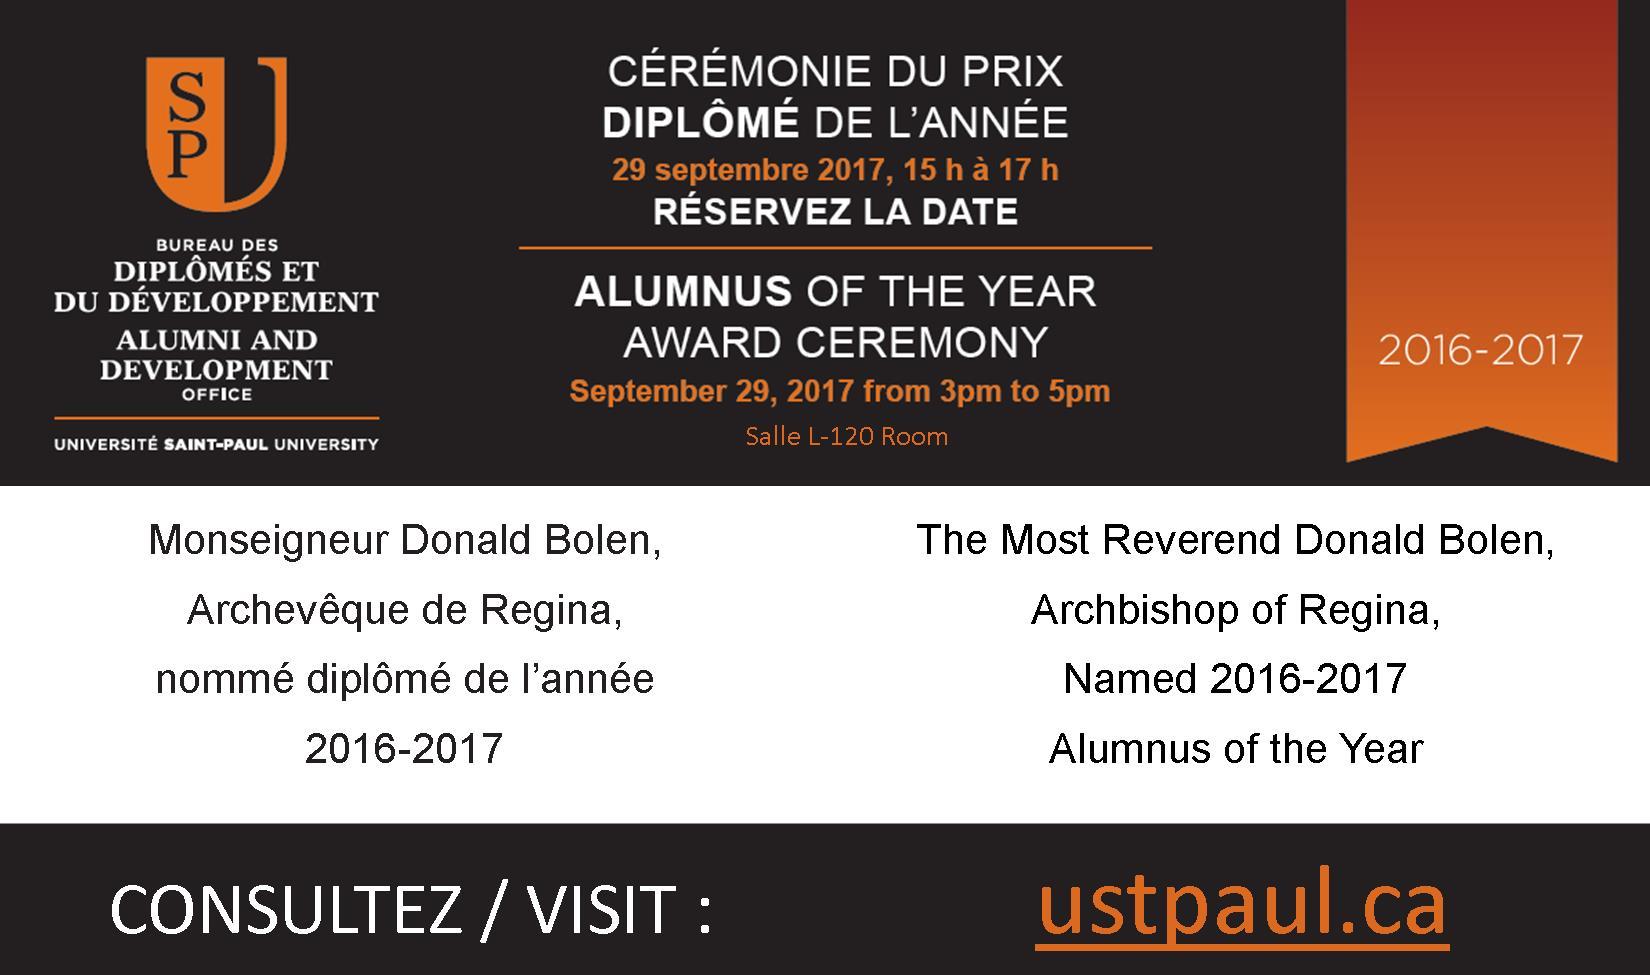 Alumnus of the year